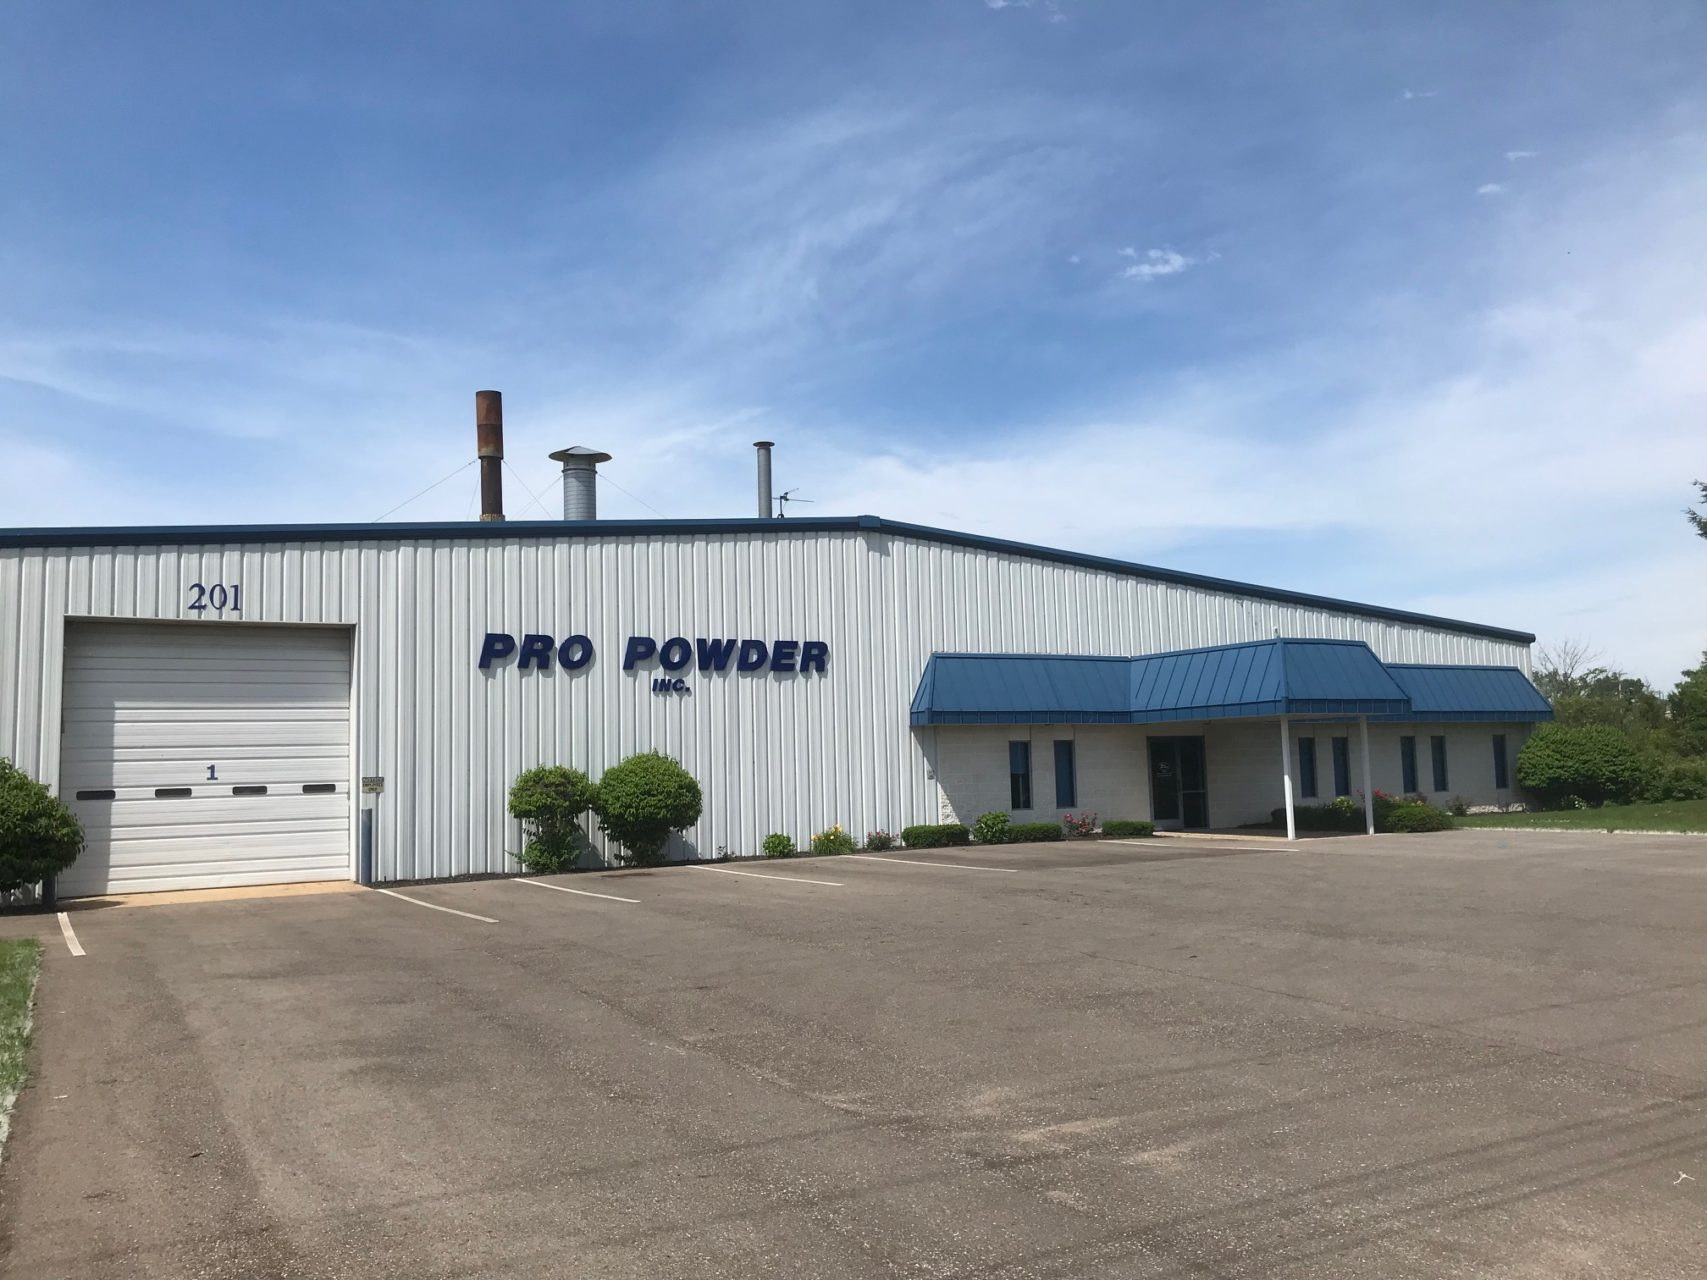 Pro Powder Building